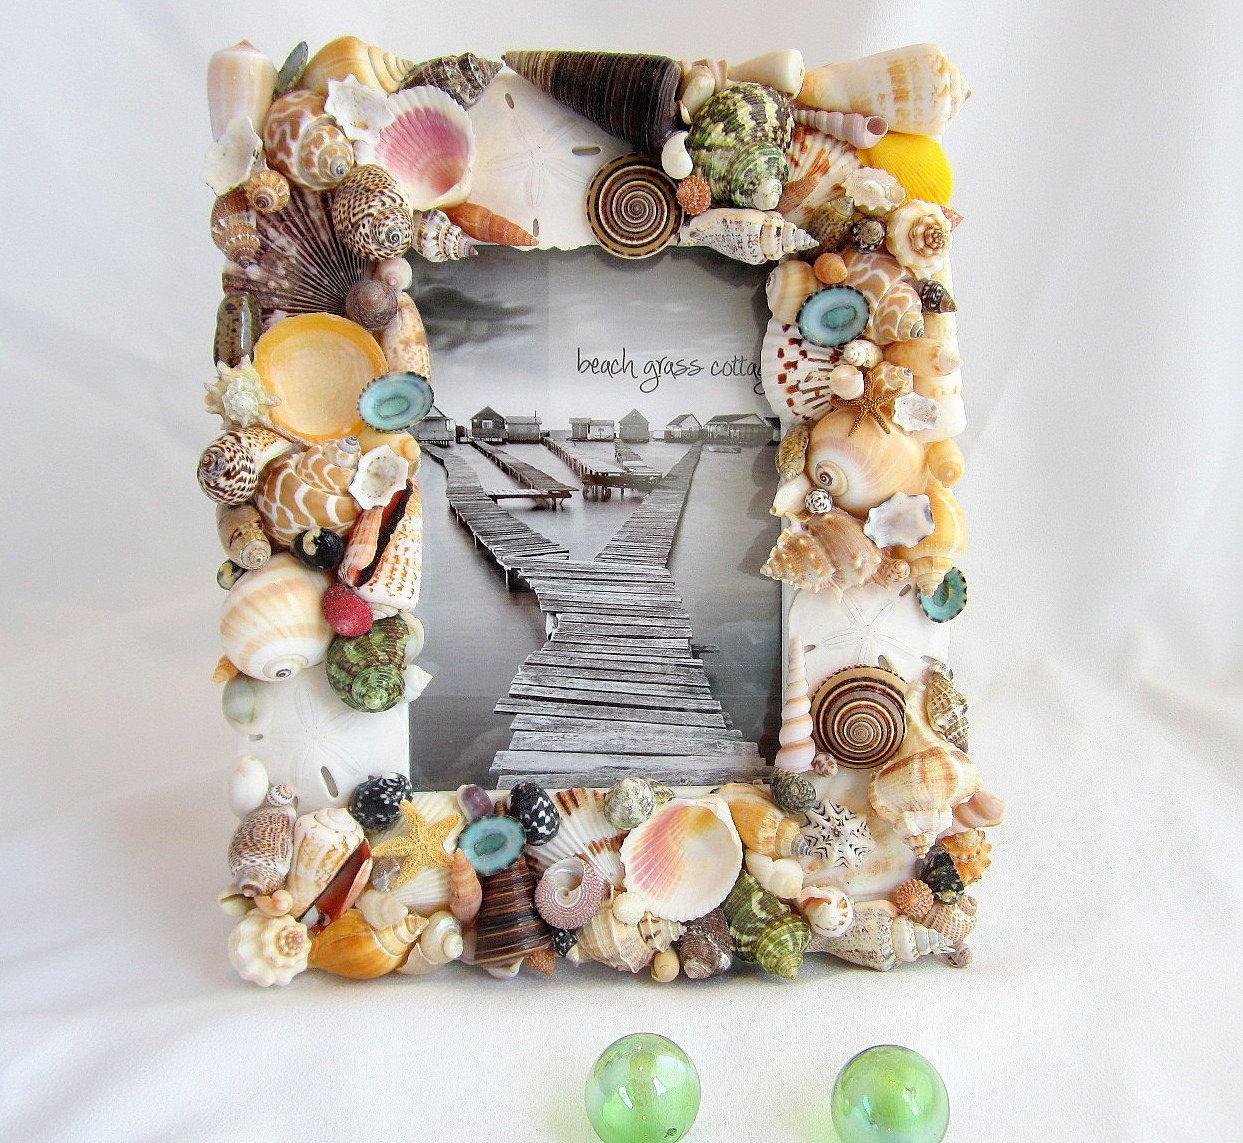 Beach Decor Seashell Frame Nautical Decor Colored Shell Picture Frame Coastal Decor Beach Wedding Gift Beach Wedding Frame 8x10 Seashell Frame Beach Wedding Gifts Sea Shells